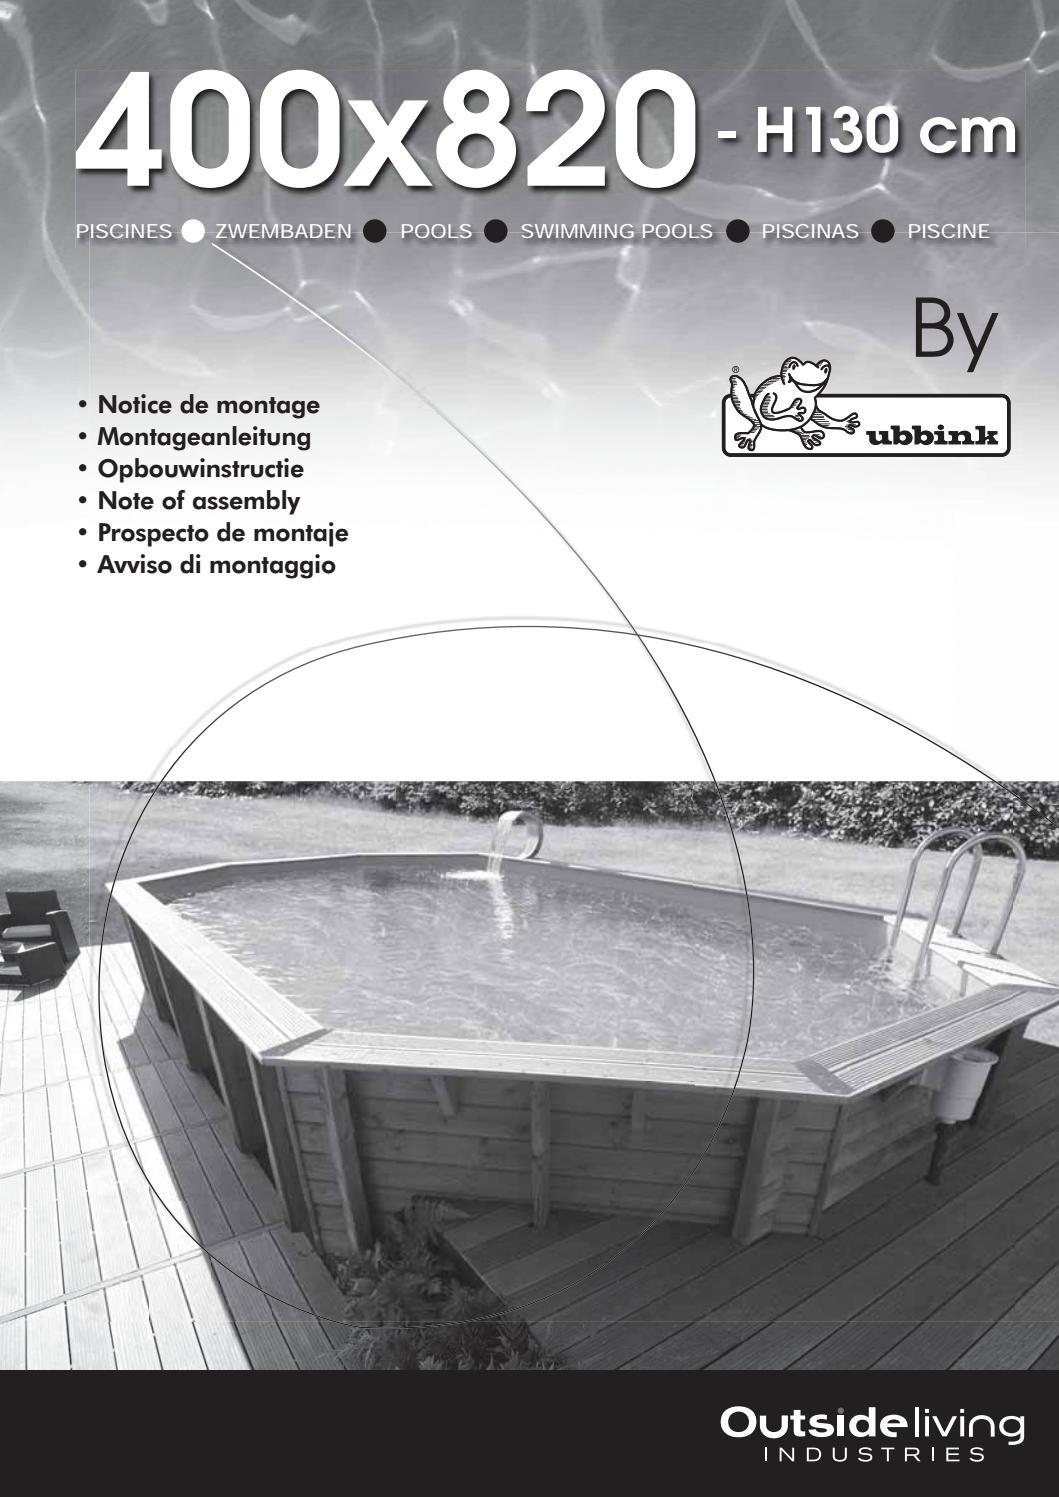 Notice 400X820 - H130-2018_1 K.pdf By ____ - Issuu serapportantà Chloramine Piscine